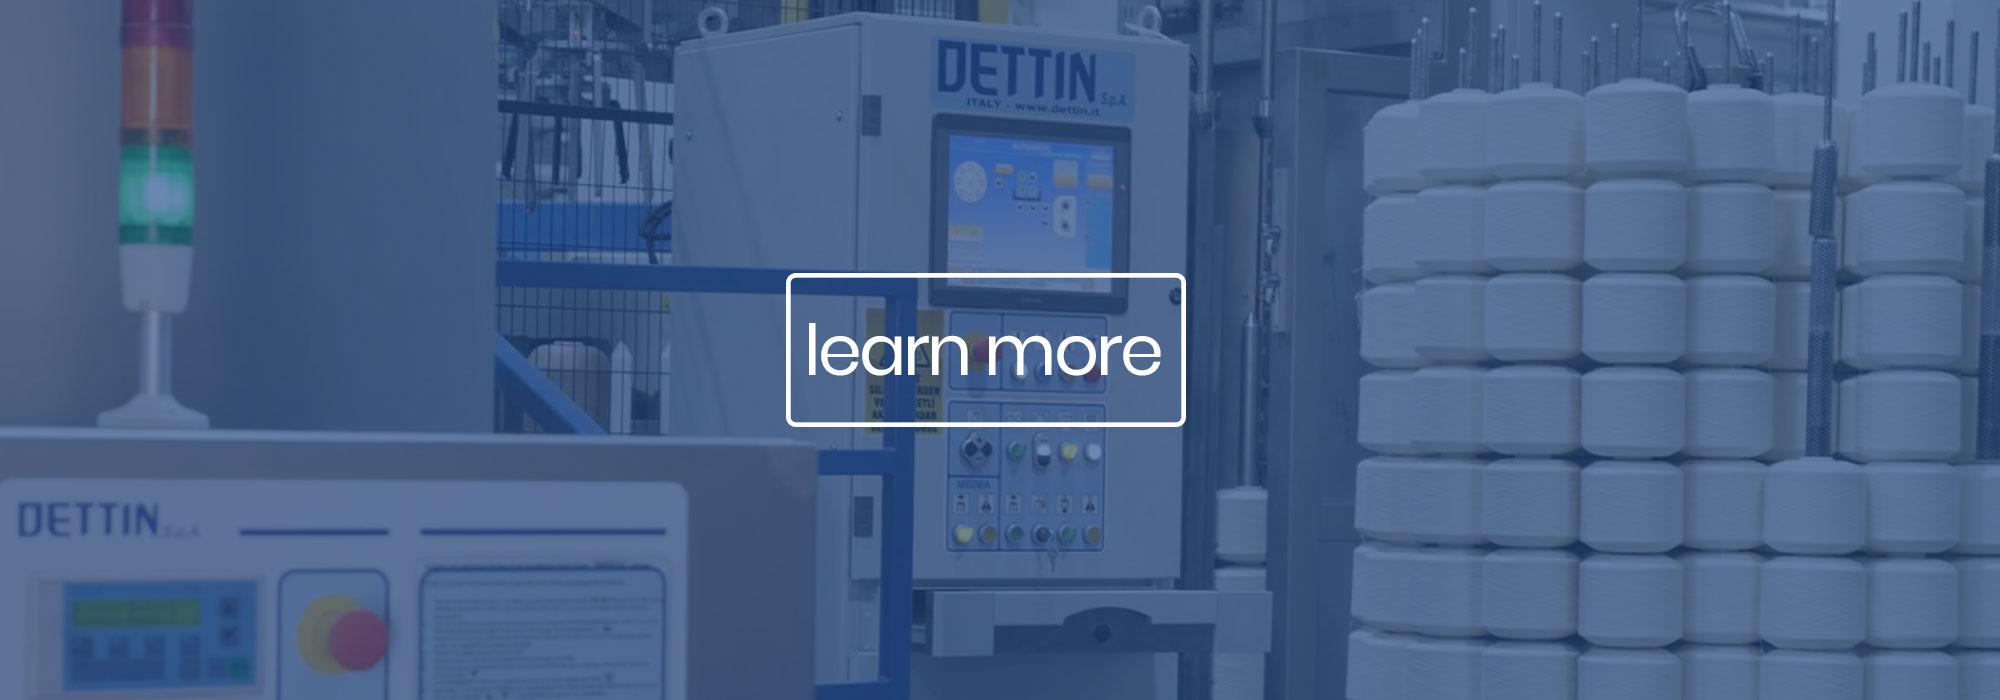 textile_machinery